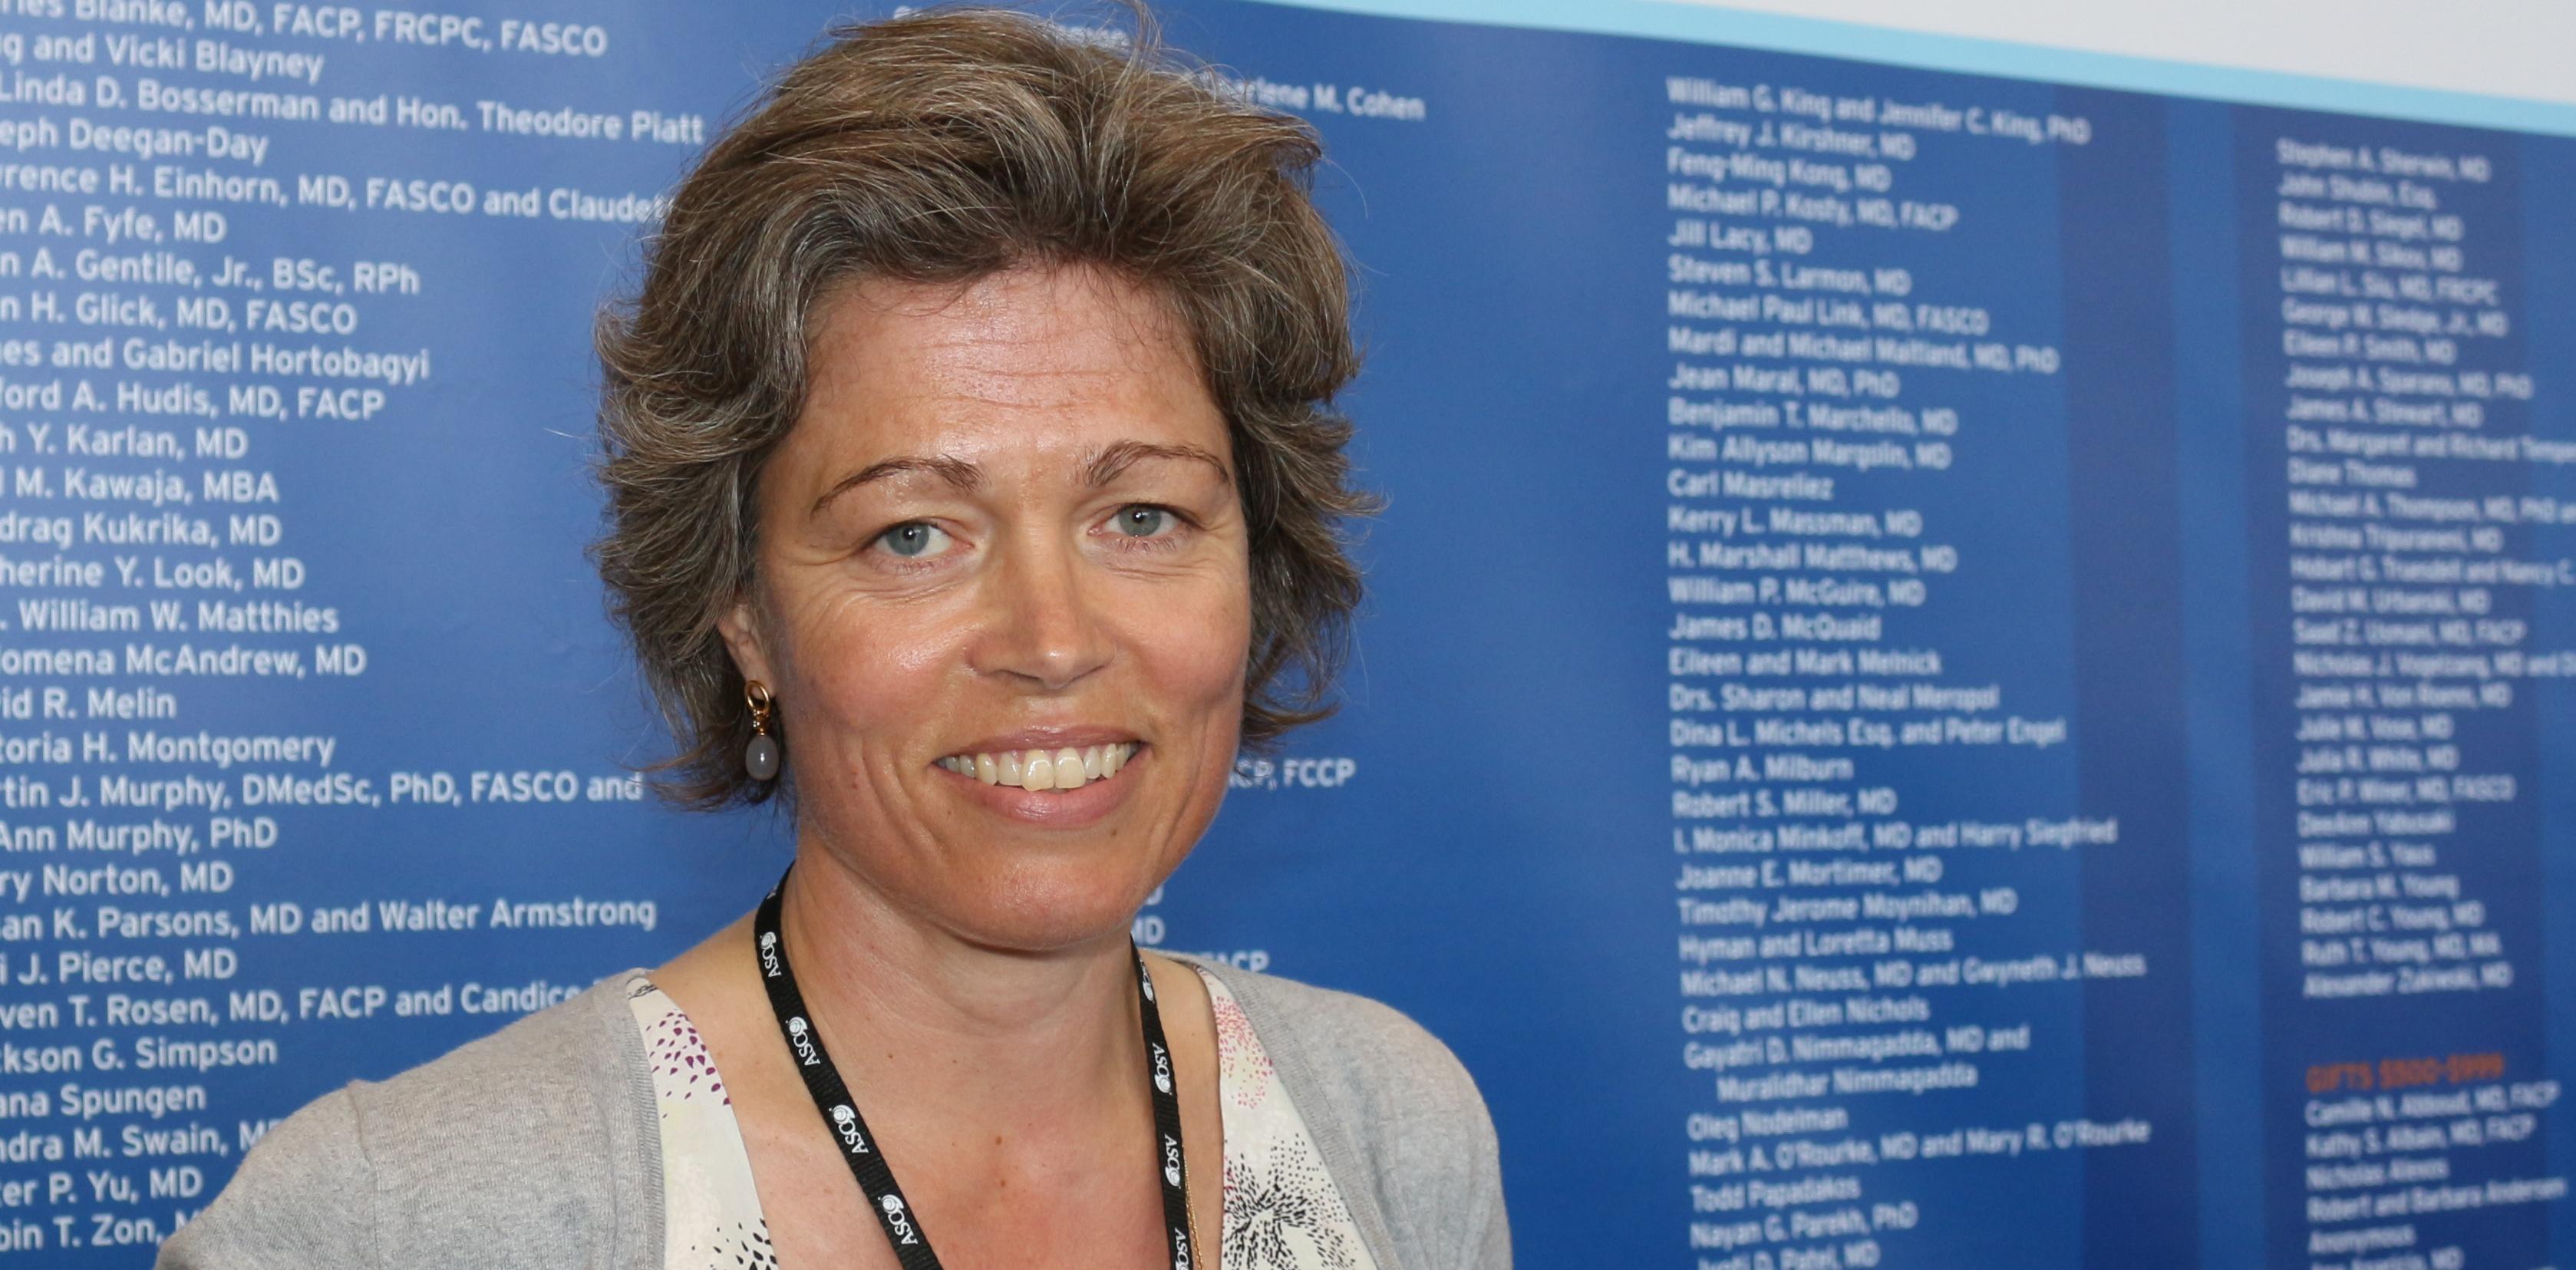 Birgitte Offersen